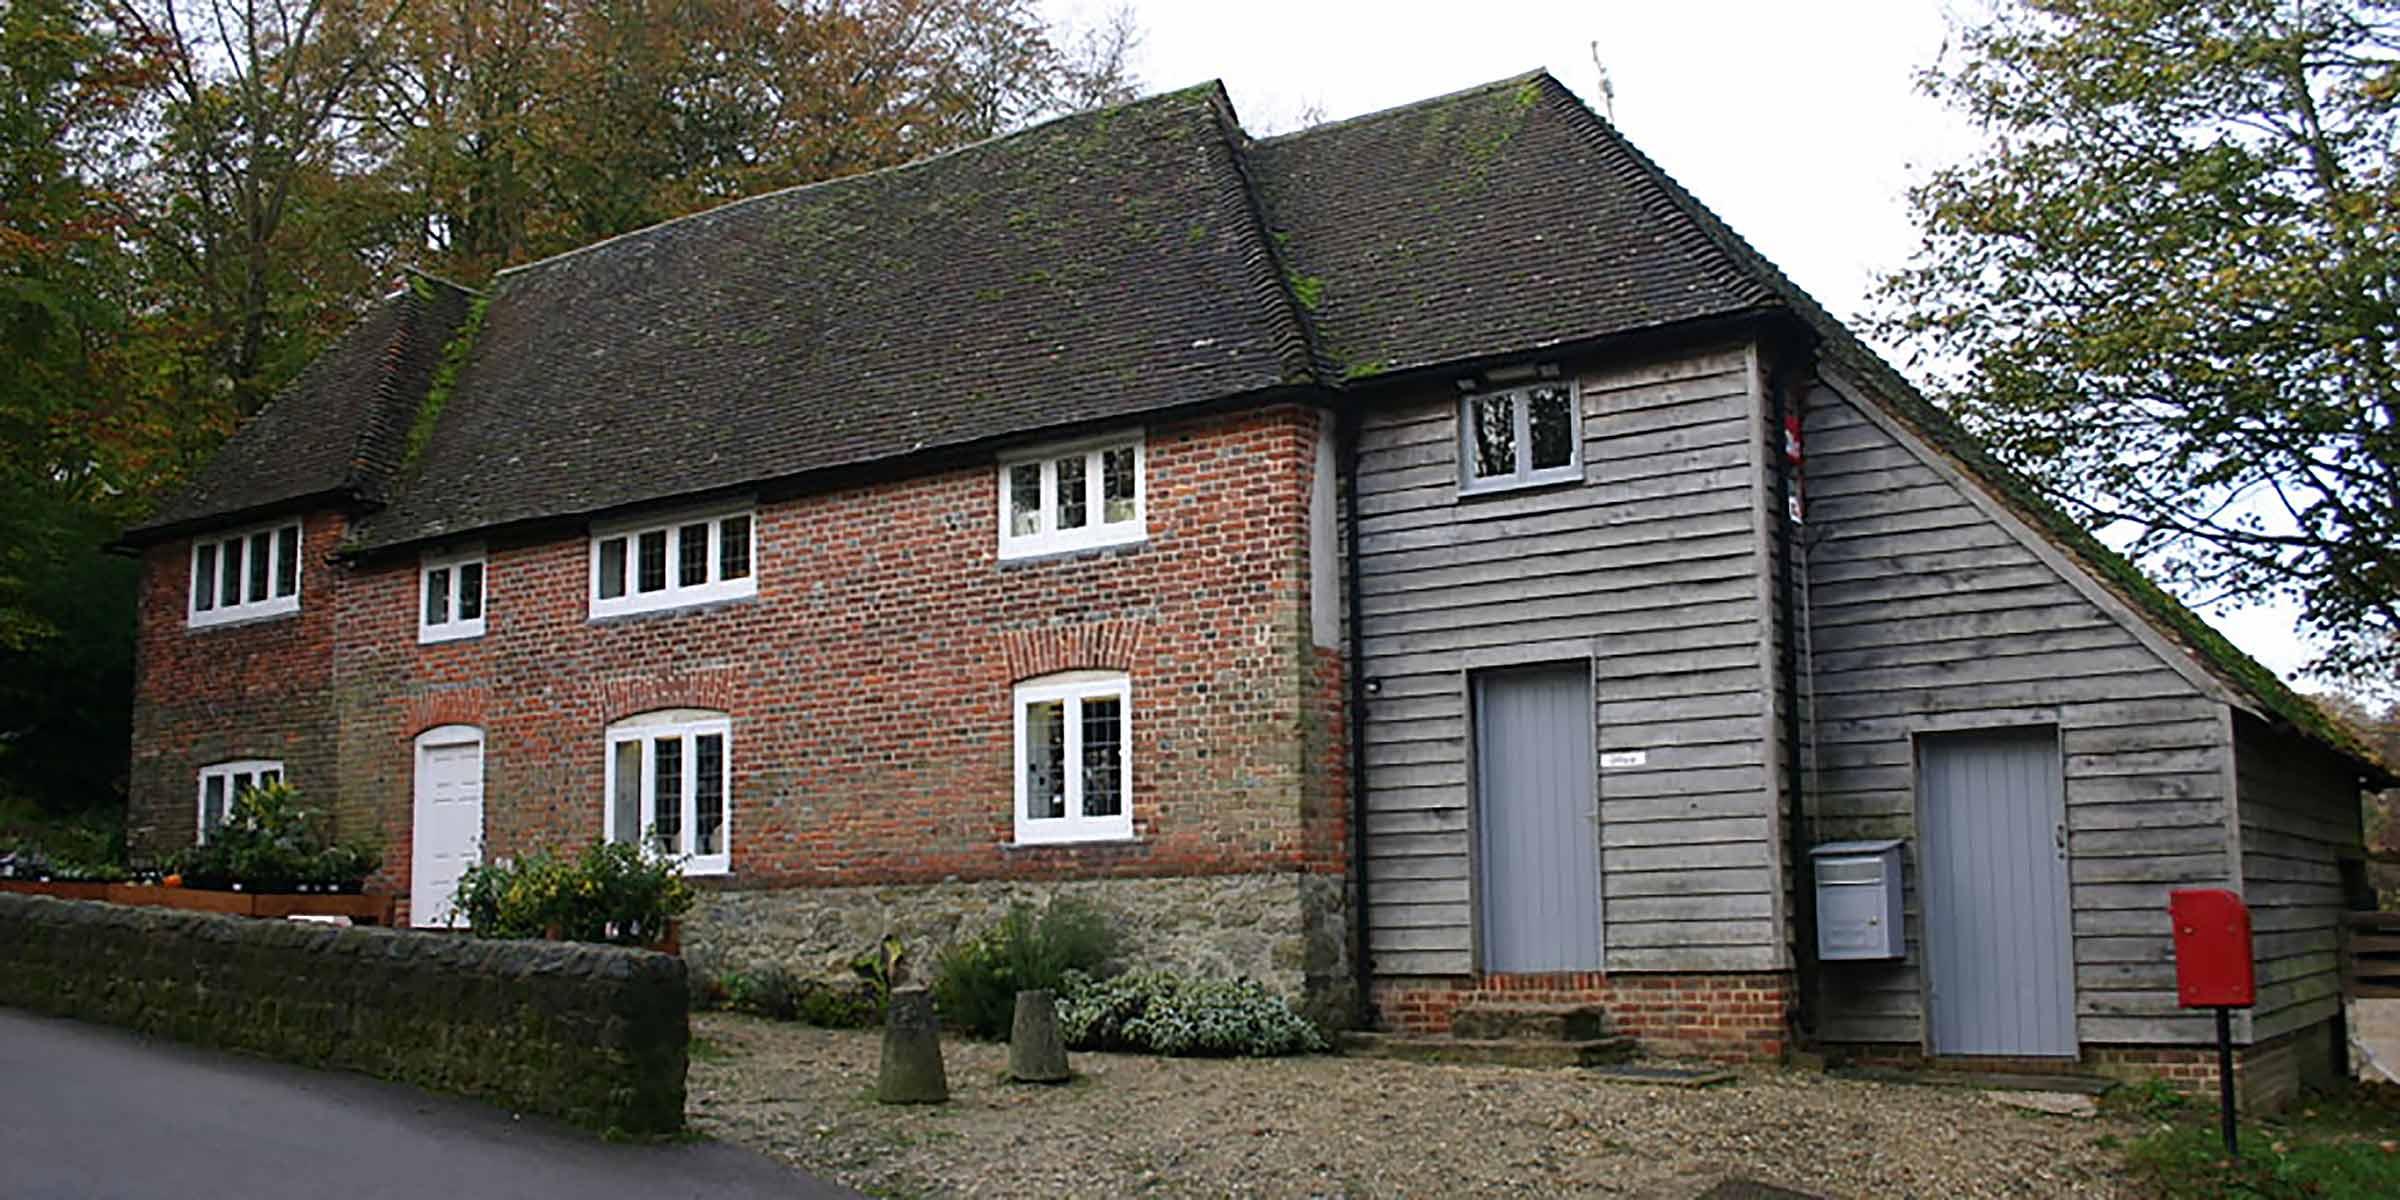 Longport Farmhouse from Newington